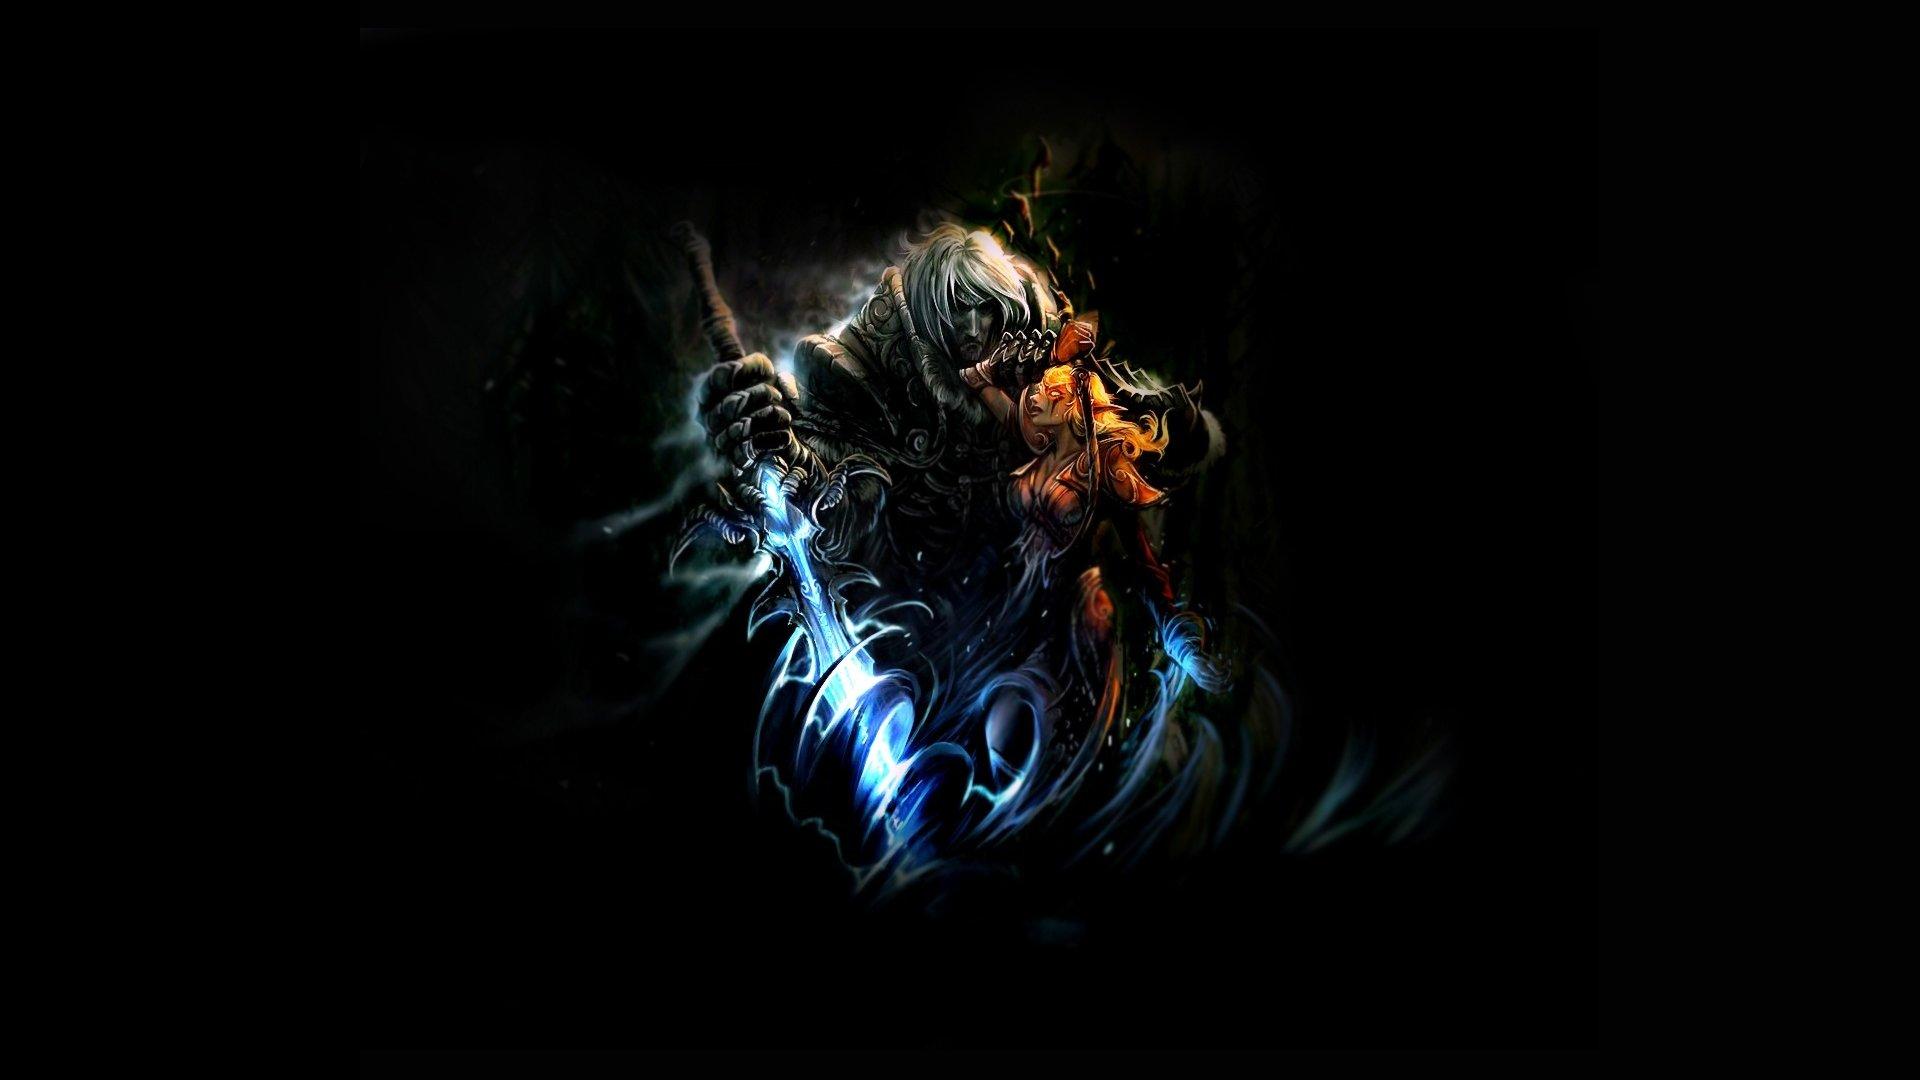 Videojuego - World Of Warcraft  Night Elf Espada Mágico Horde King Arthas Dekaron Ojo Guerra Videojuego Fondo de Pantalla